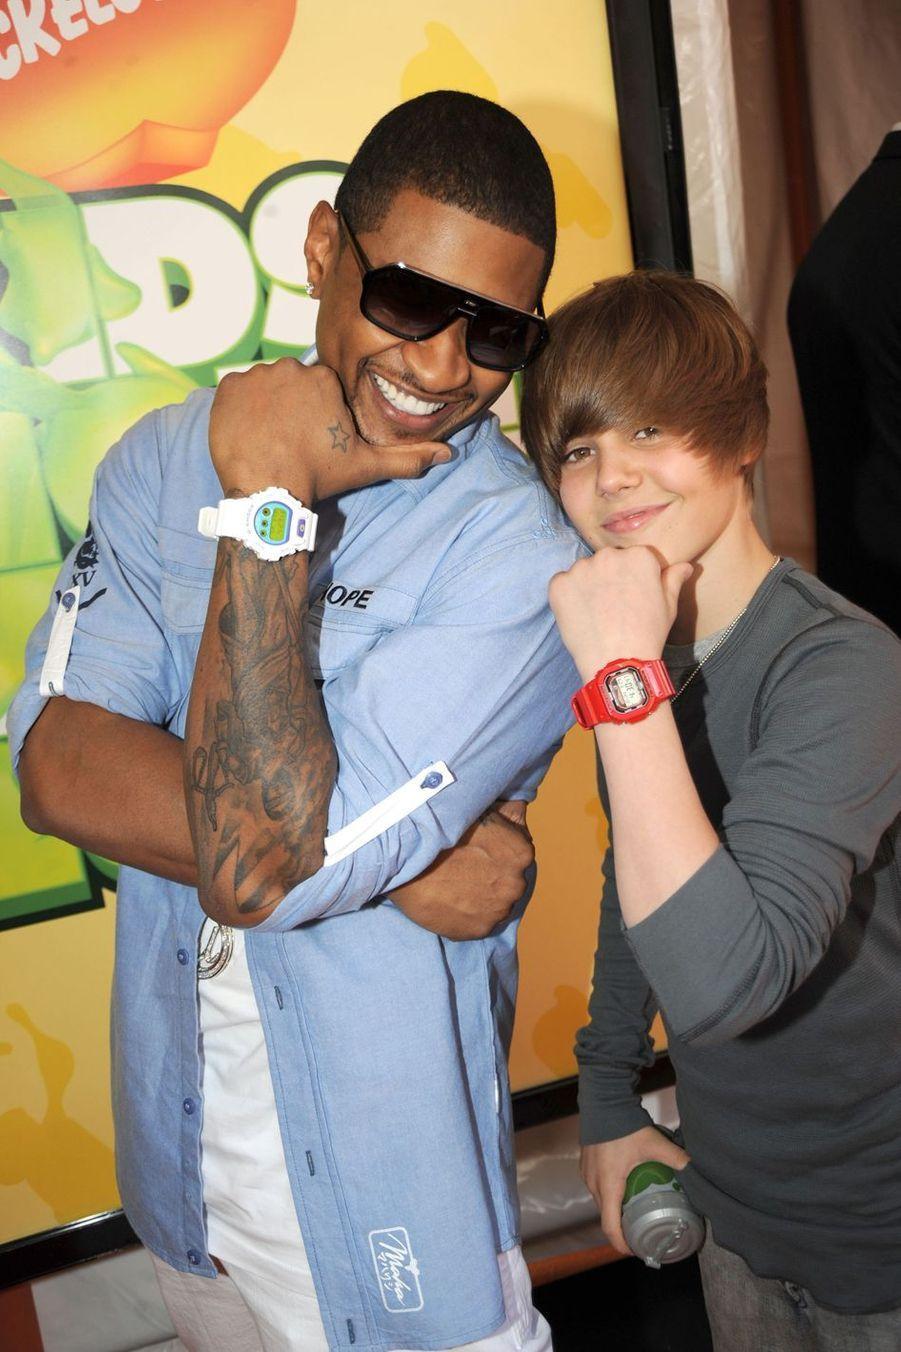 Justin Bieber avec Usher, son mentor, lors desNickelodeon's Kids' Choice Awards en mars 2009 à Westwood